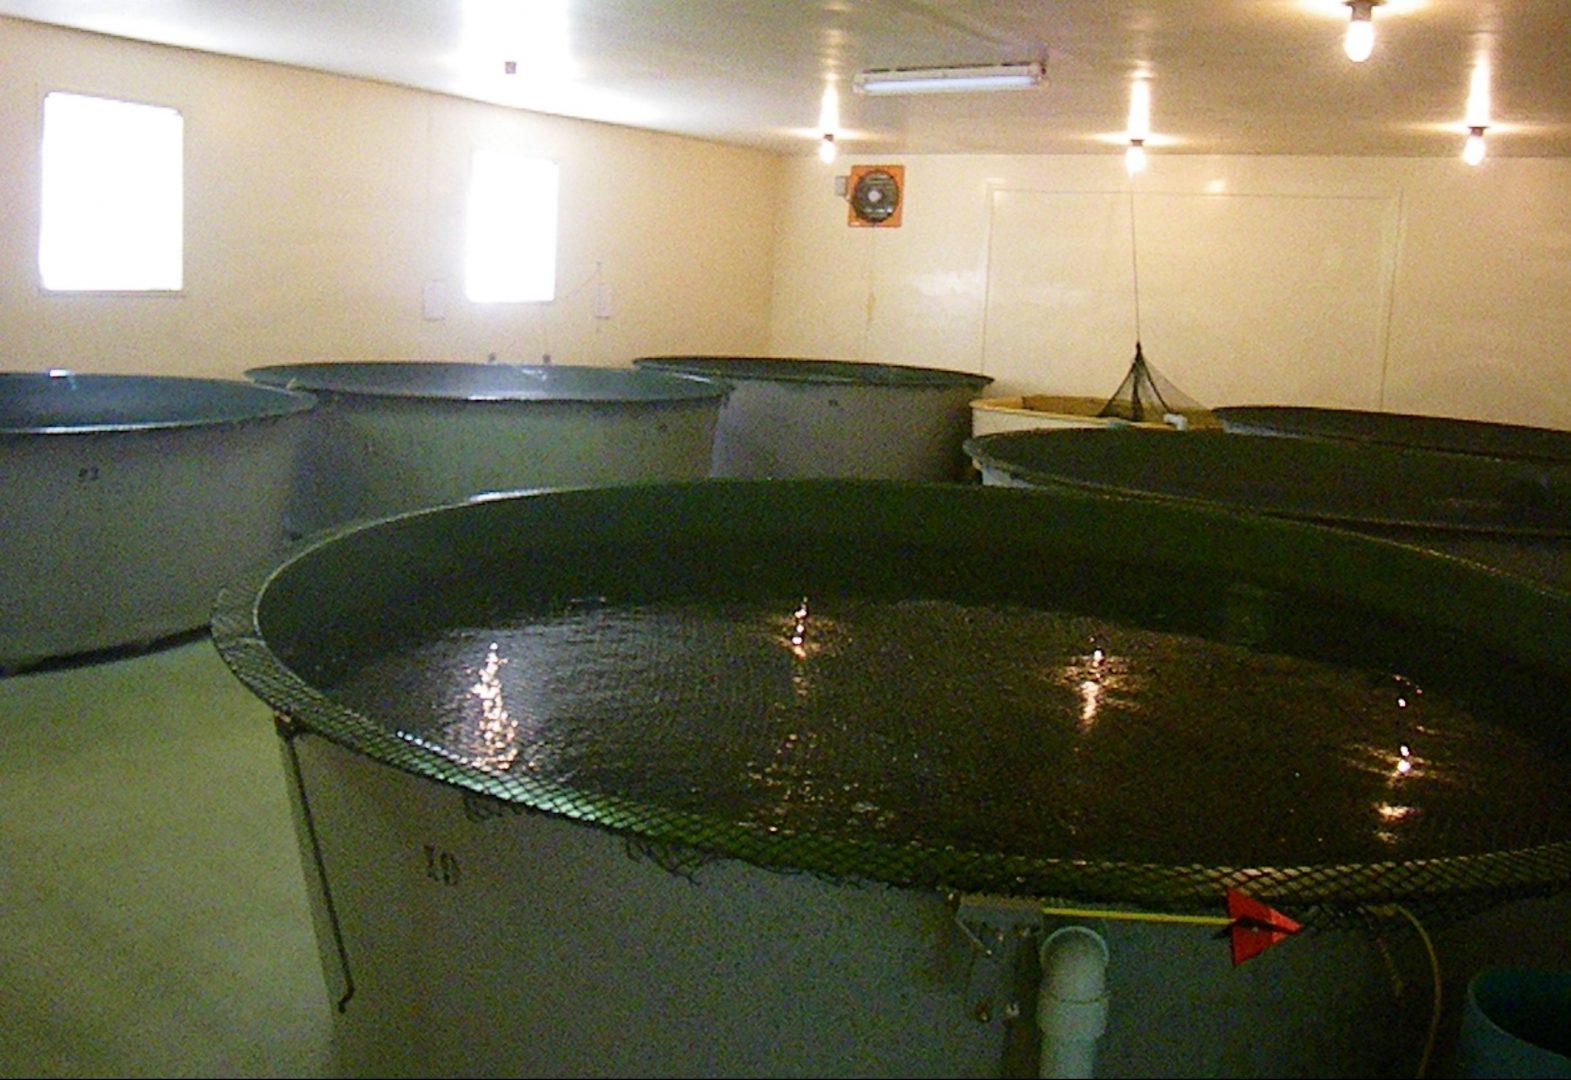 Production salmonicole